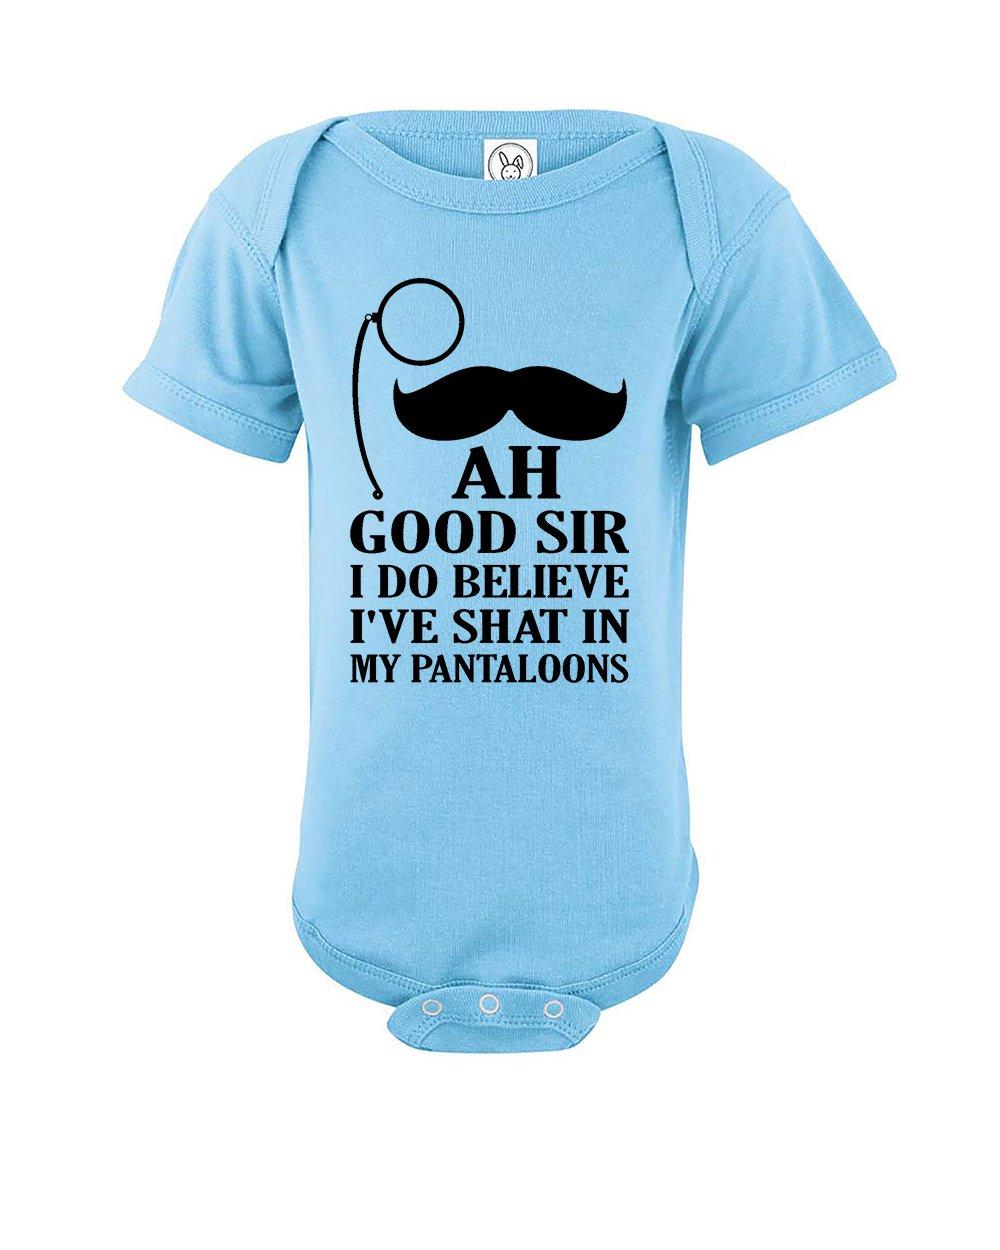 488e71ebe Esti s Baby Fashions Ah Good Sir I Do Believe I ve Shat In My ...